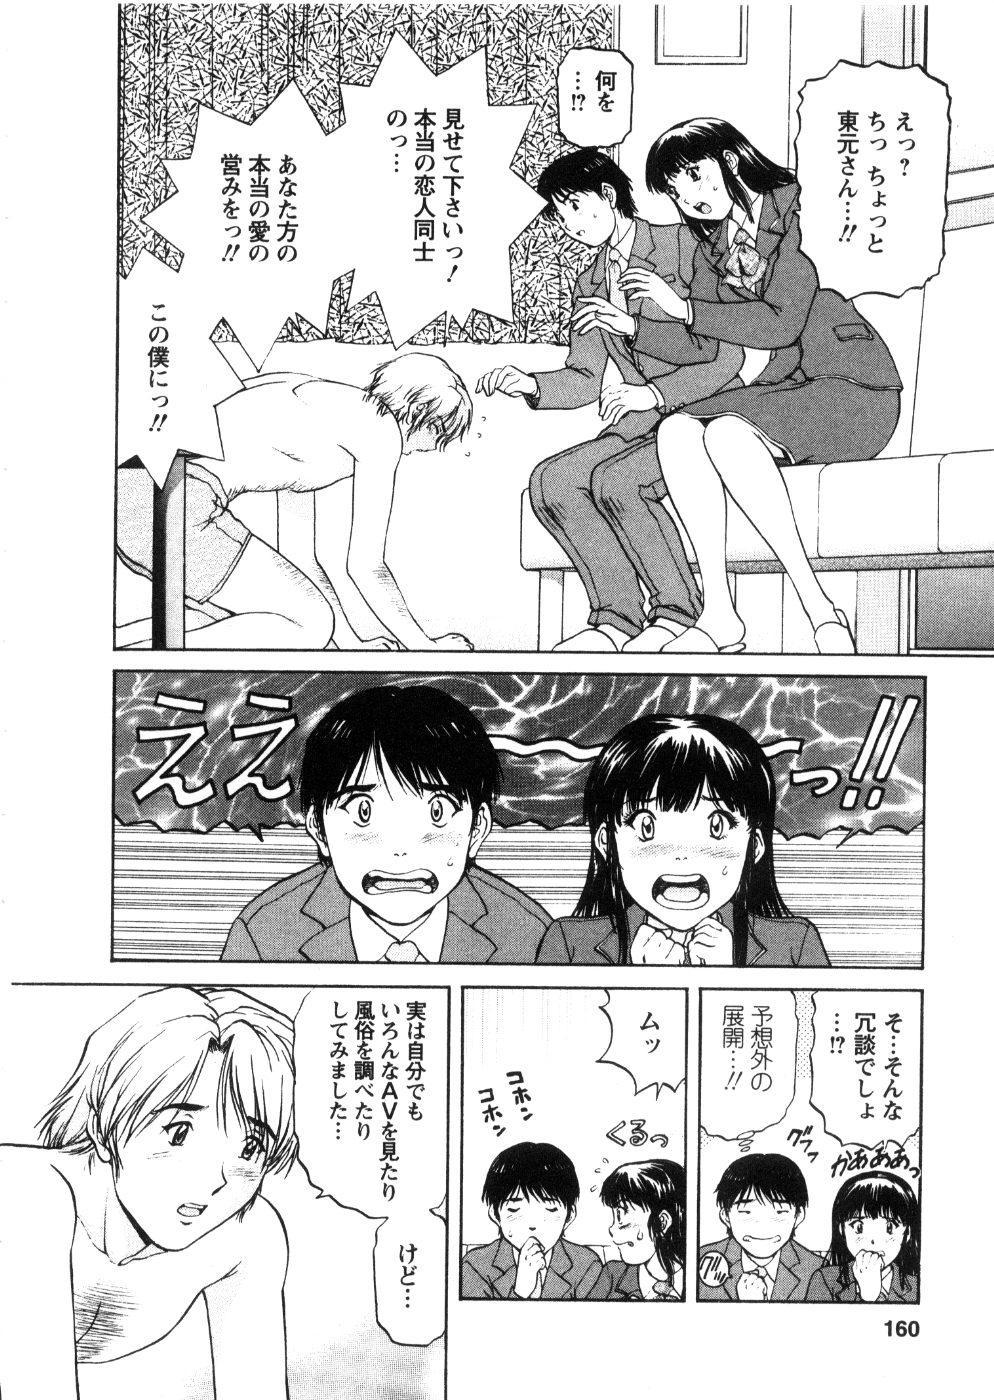 Oneechan-tachi ga Yatte Kuru 03 161